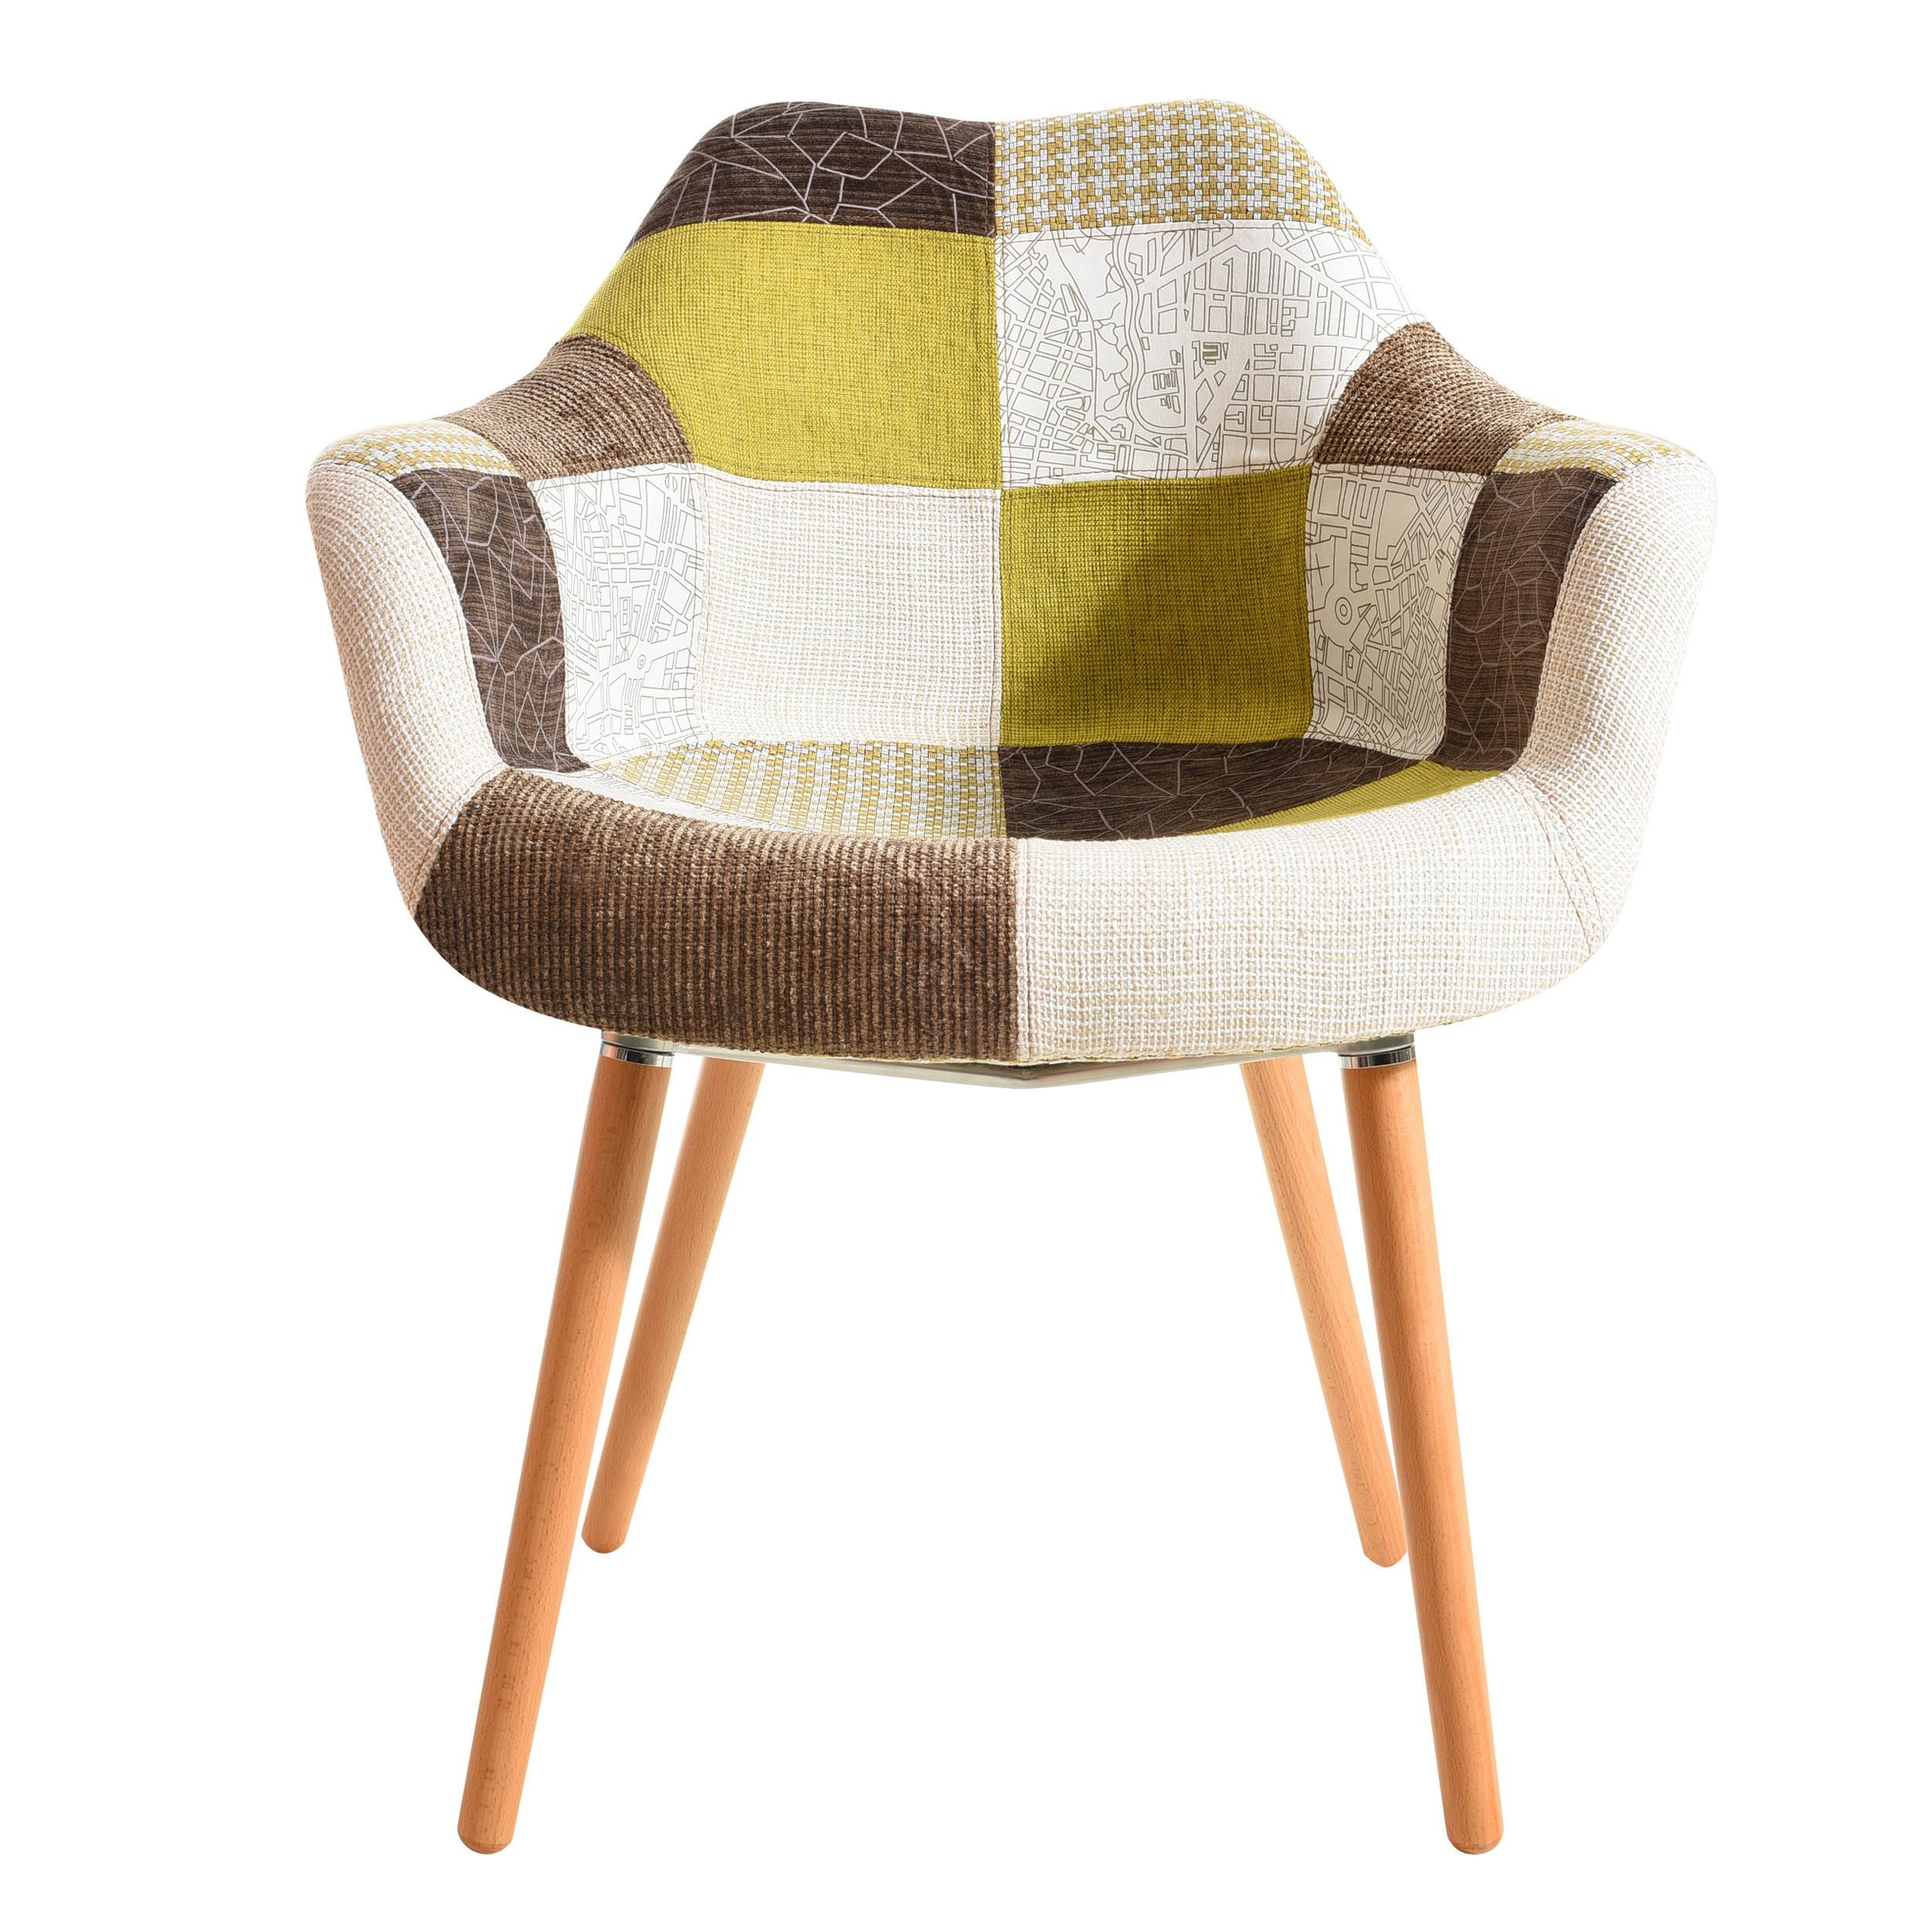 chaise anssen patchwork vert achetez nos chaises anssen patchwork vertes prix r duit rdv d co. Black Bedroom Furniture Sets. Home Design Ideas